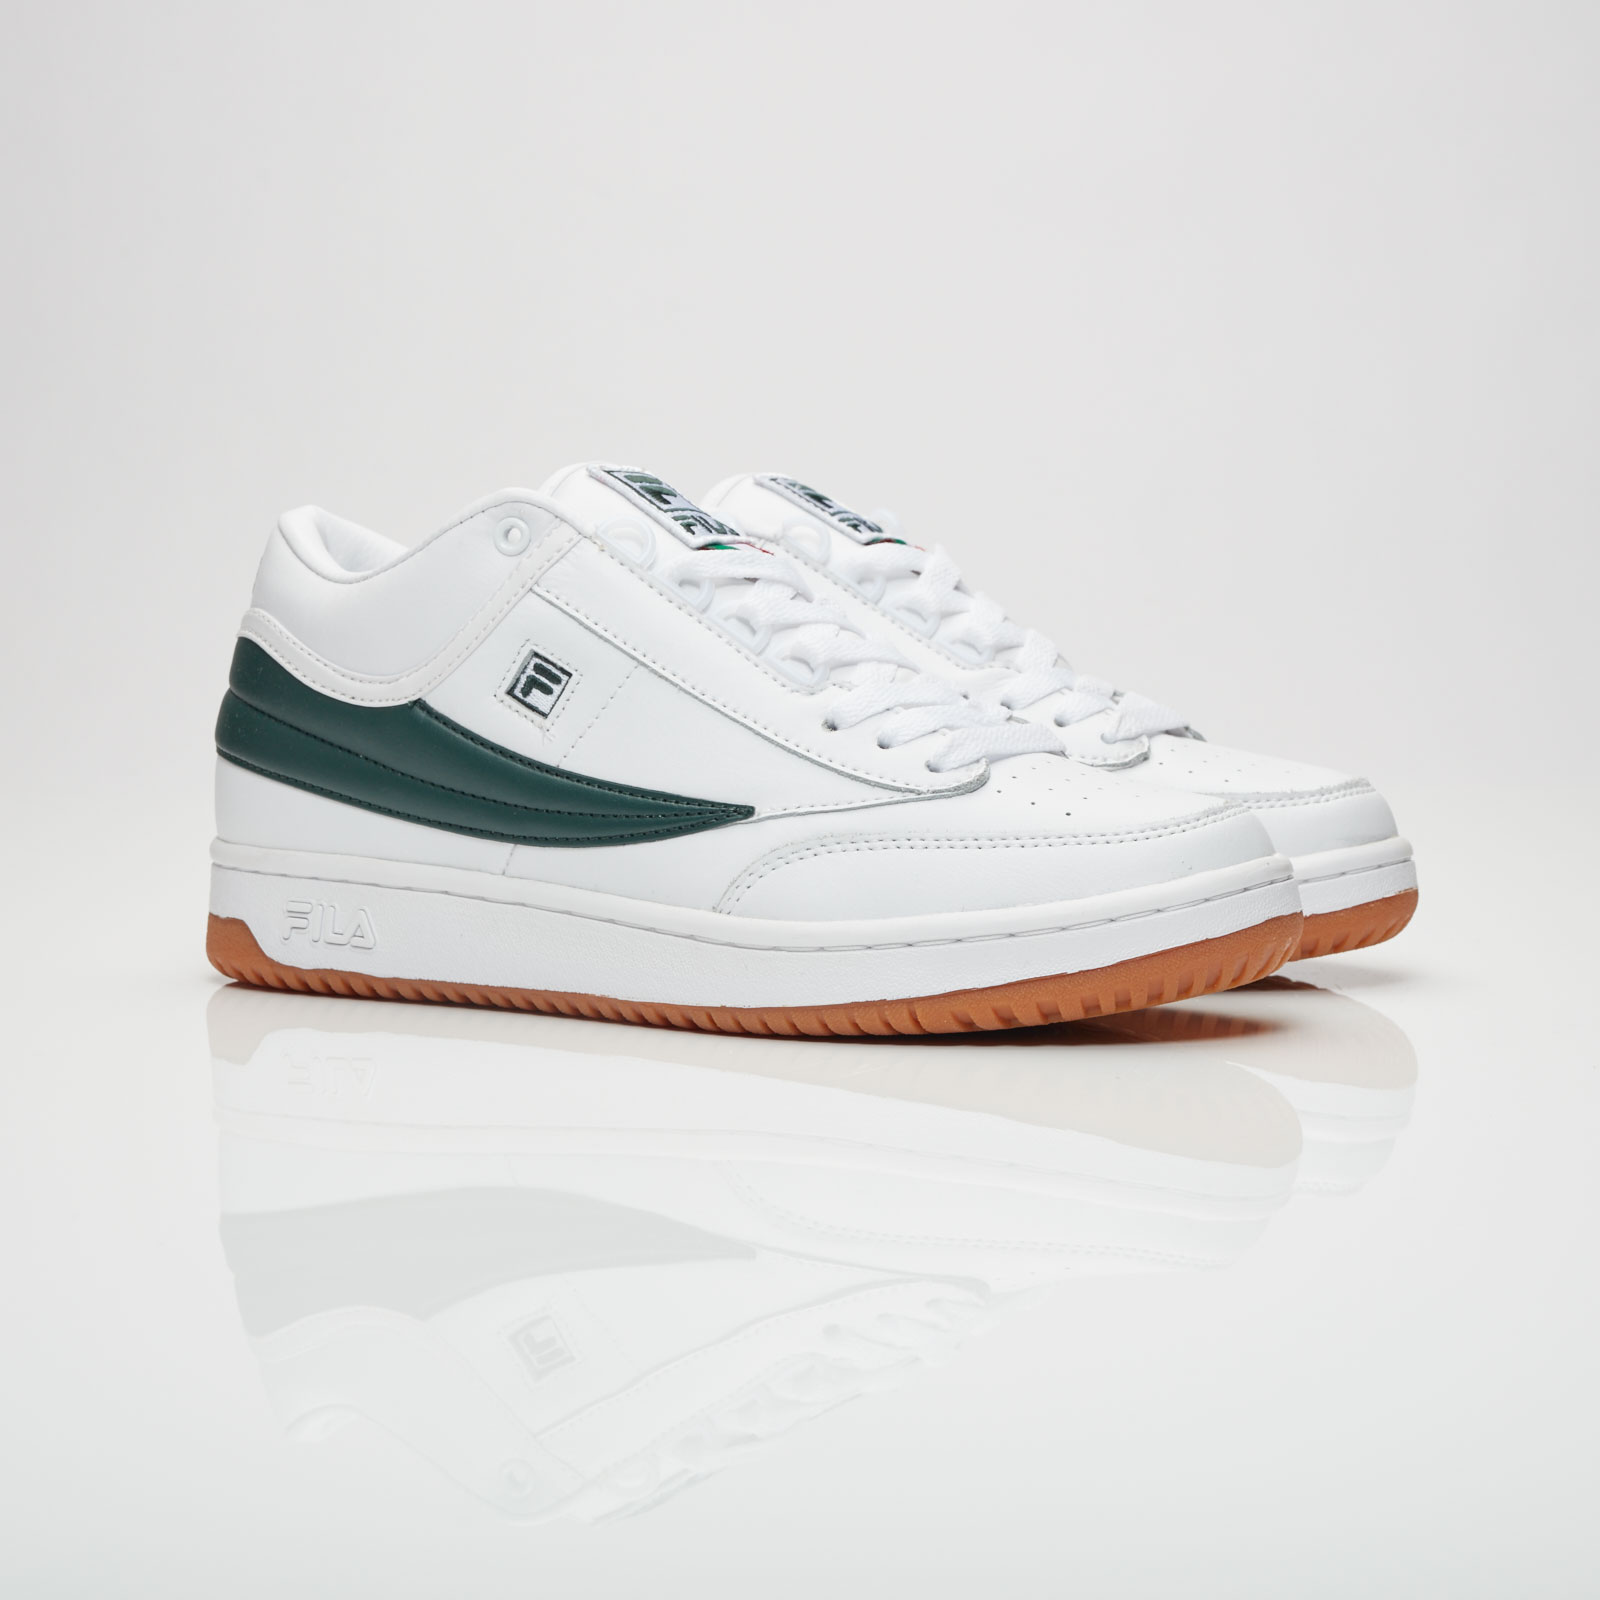 Fila T1 Mid 1vt13066 142 Sneakersnstuff | sneakers